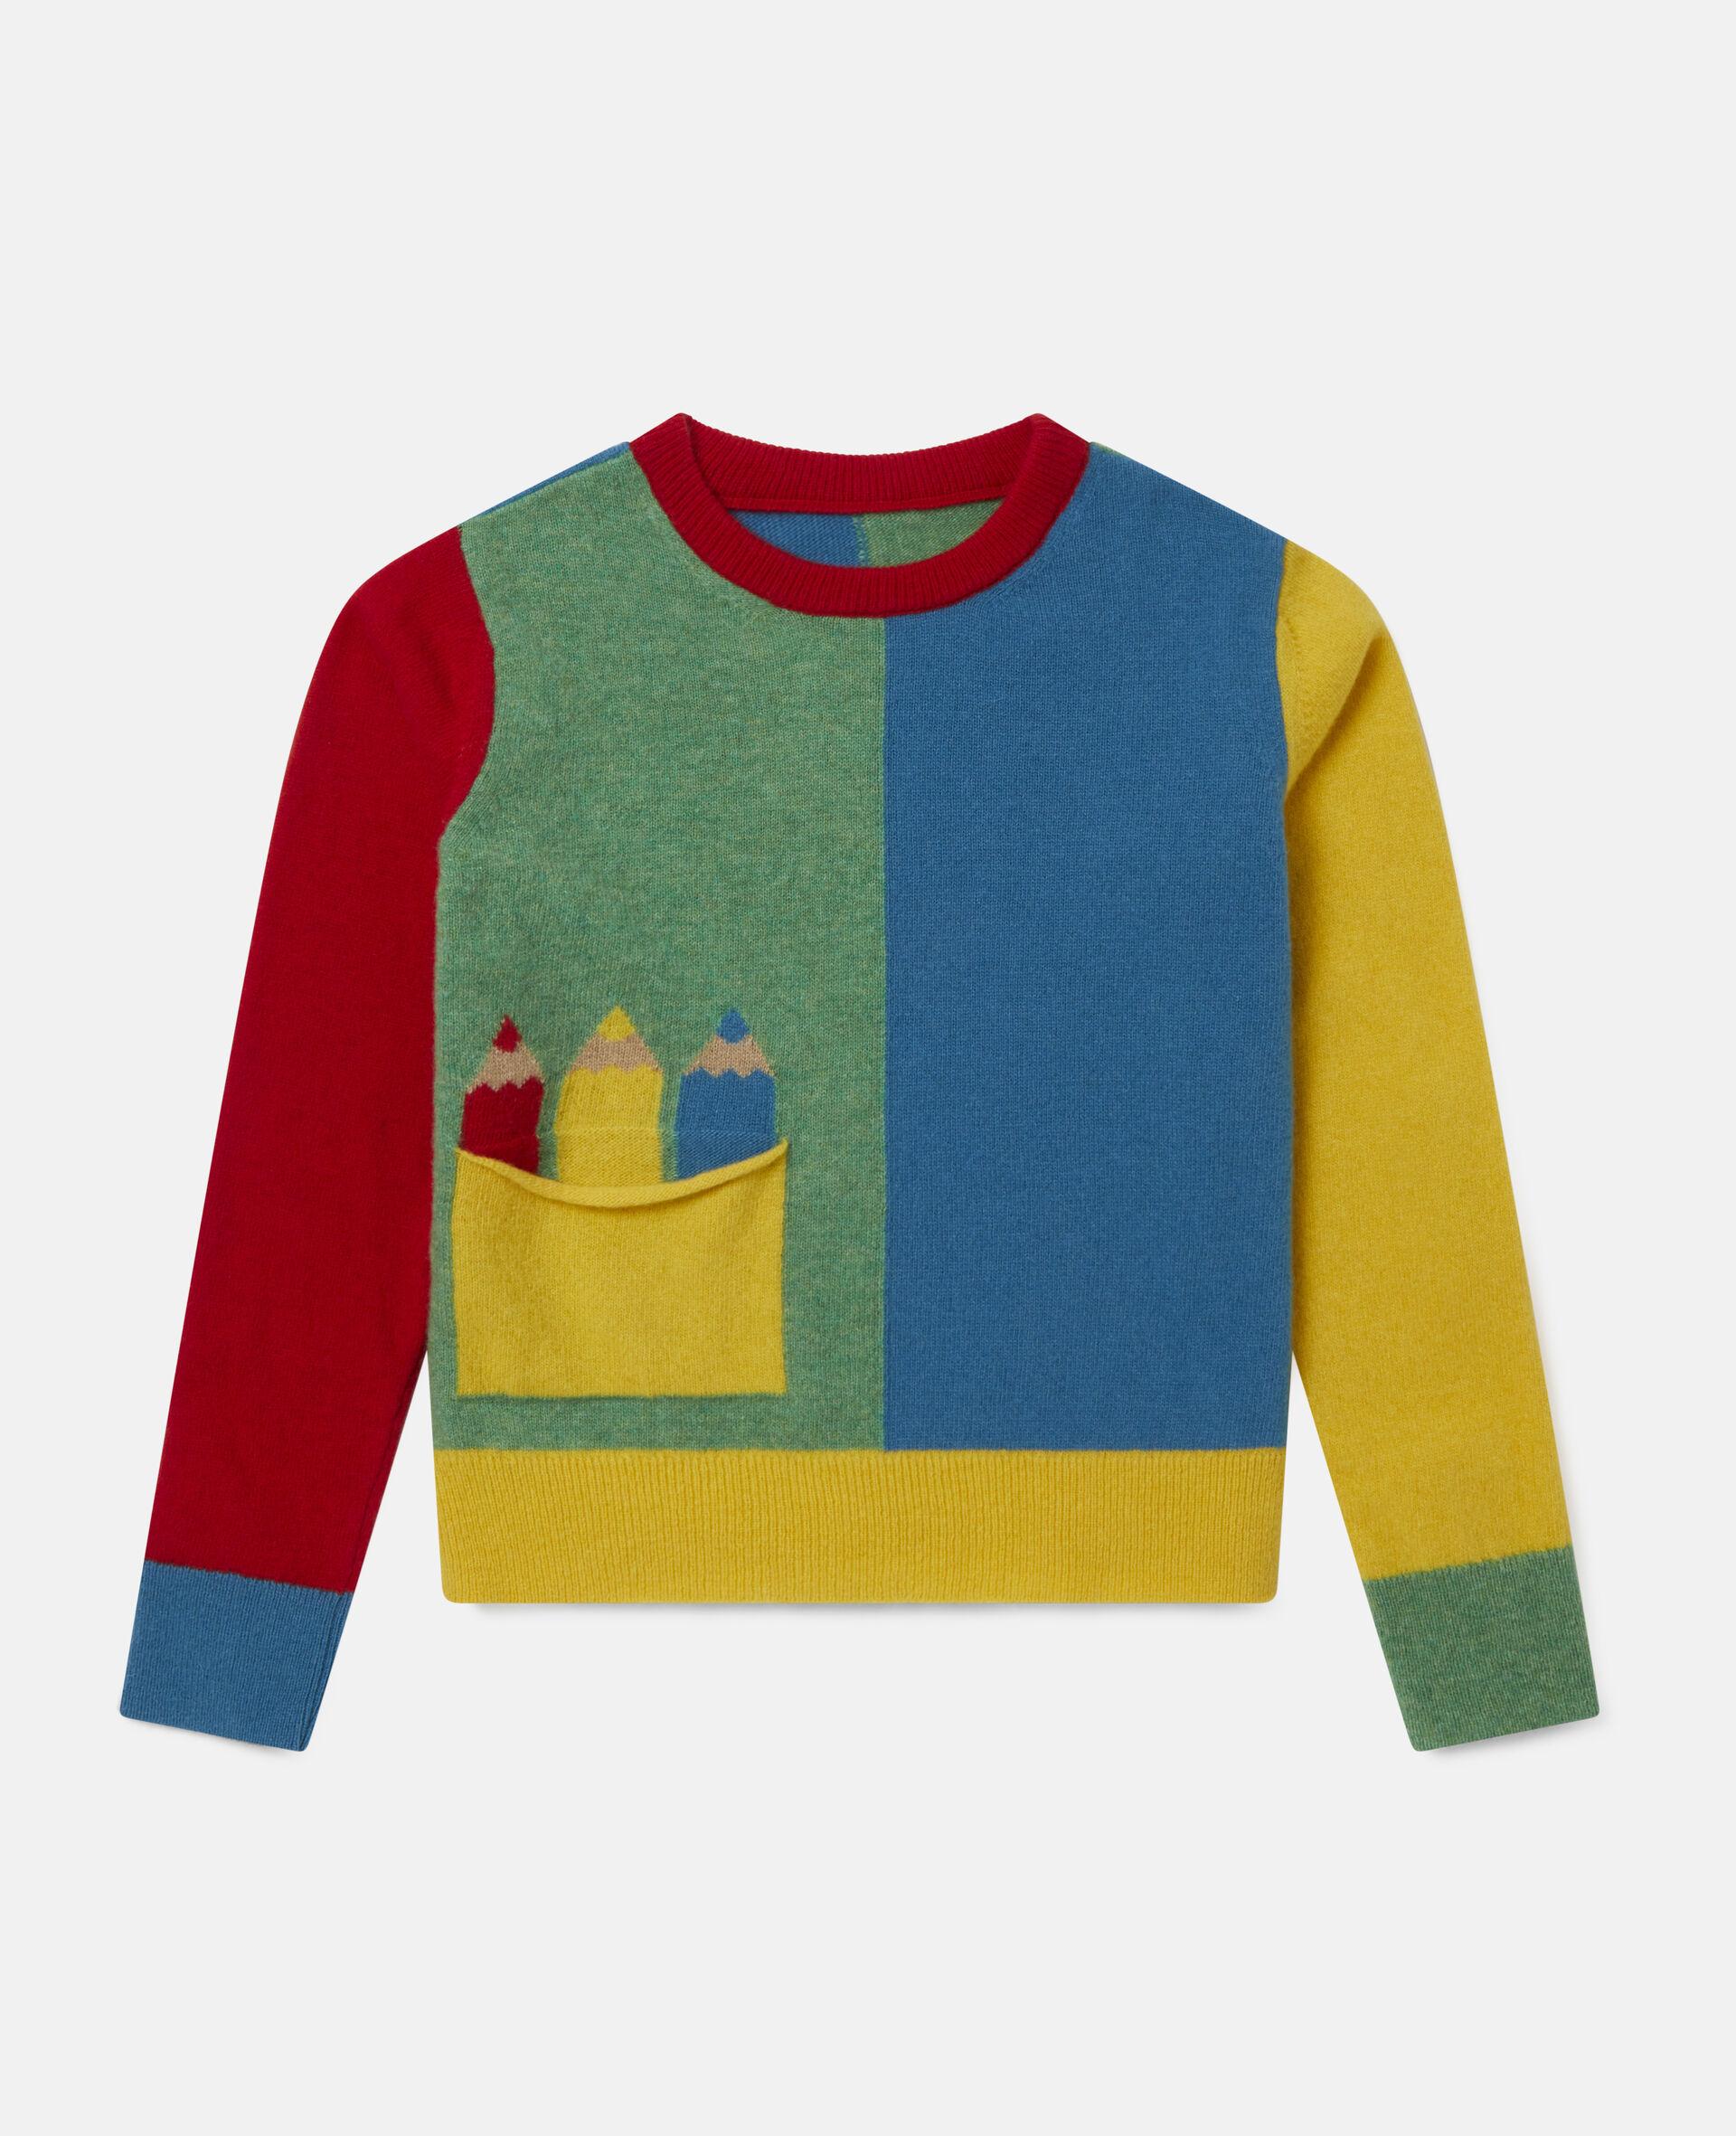 Strickpullover in Blockfarben-Design mit Intarsienmuster -Bunt-large image number 0